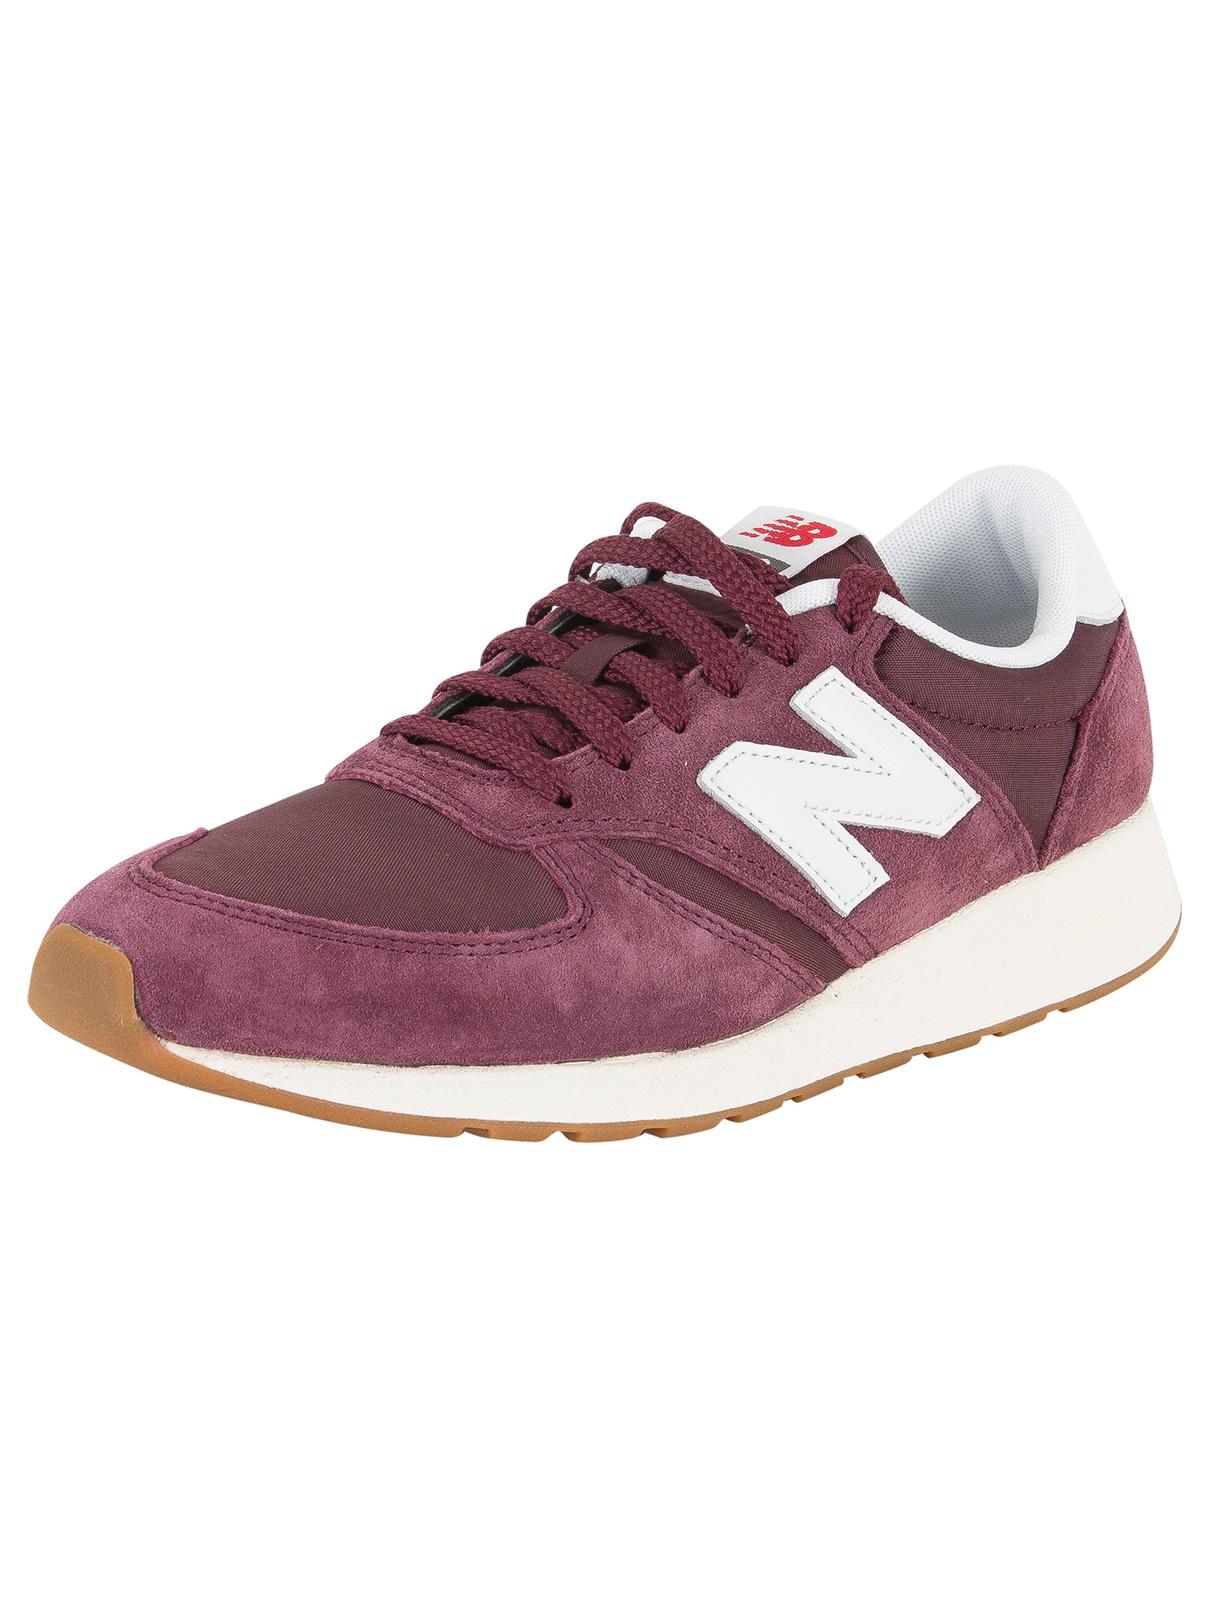 new balance red 420